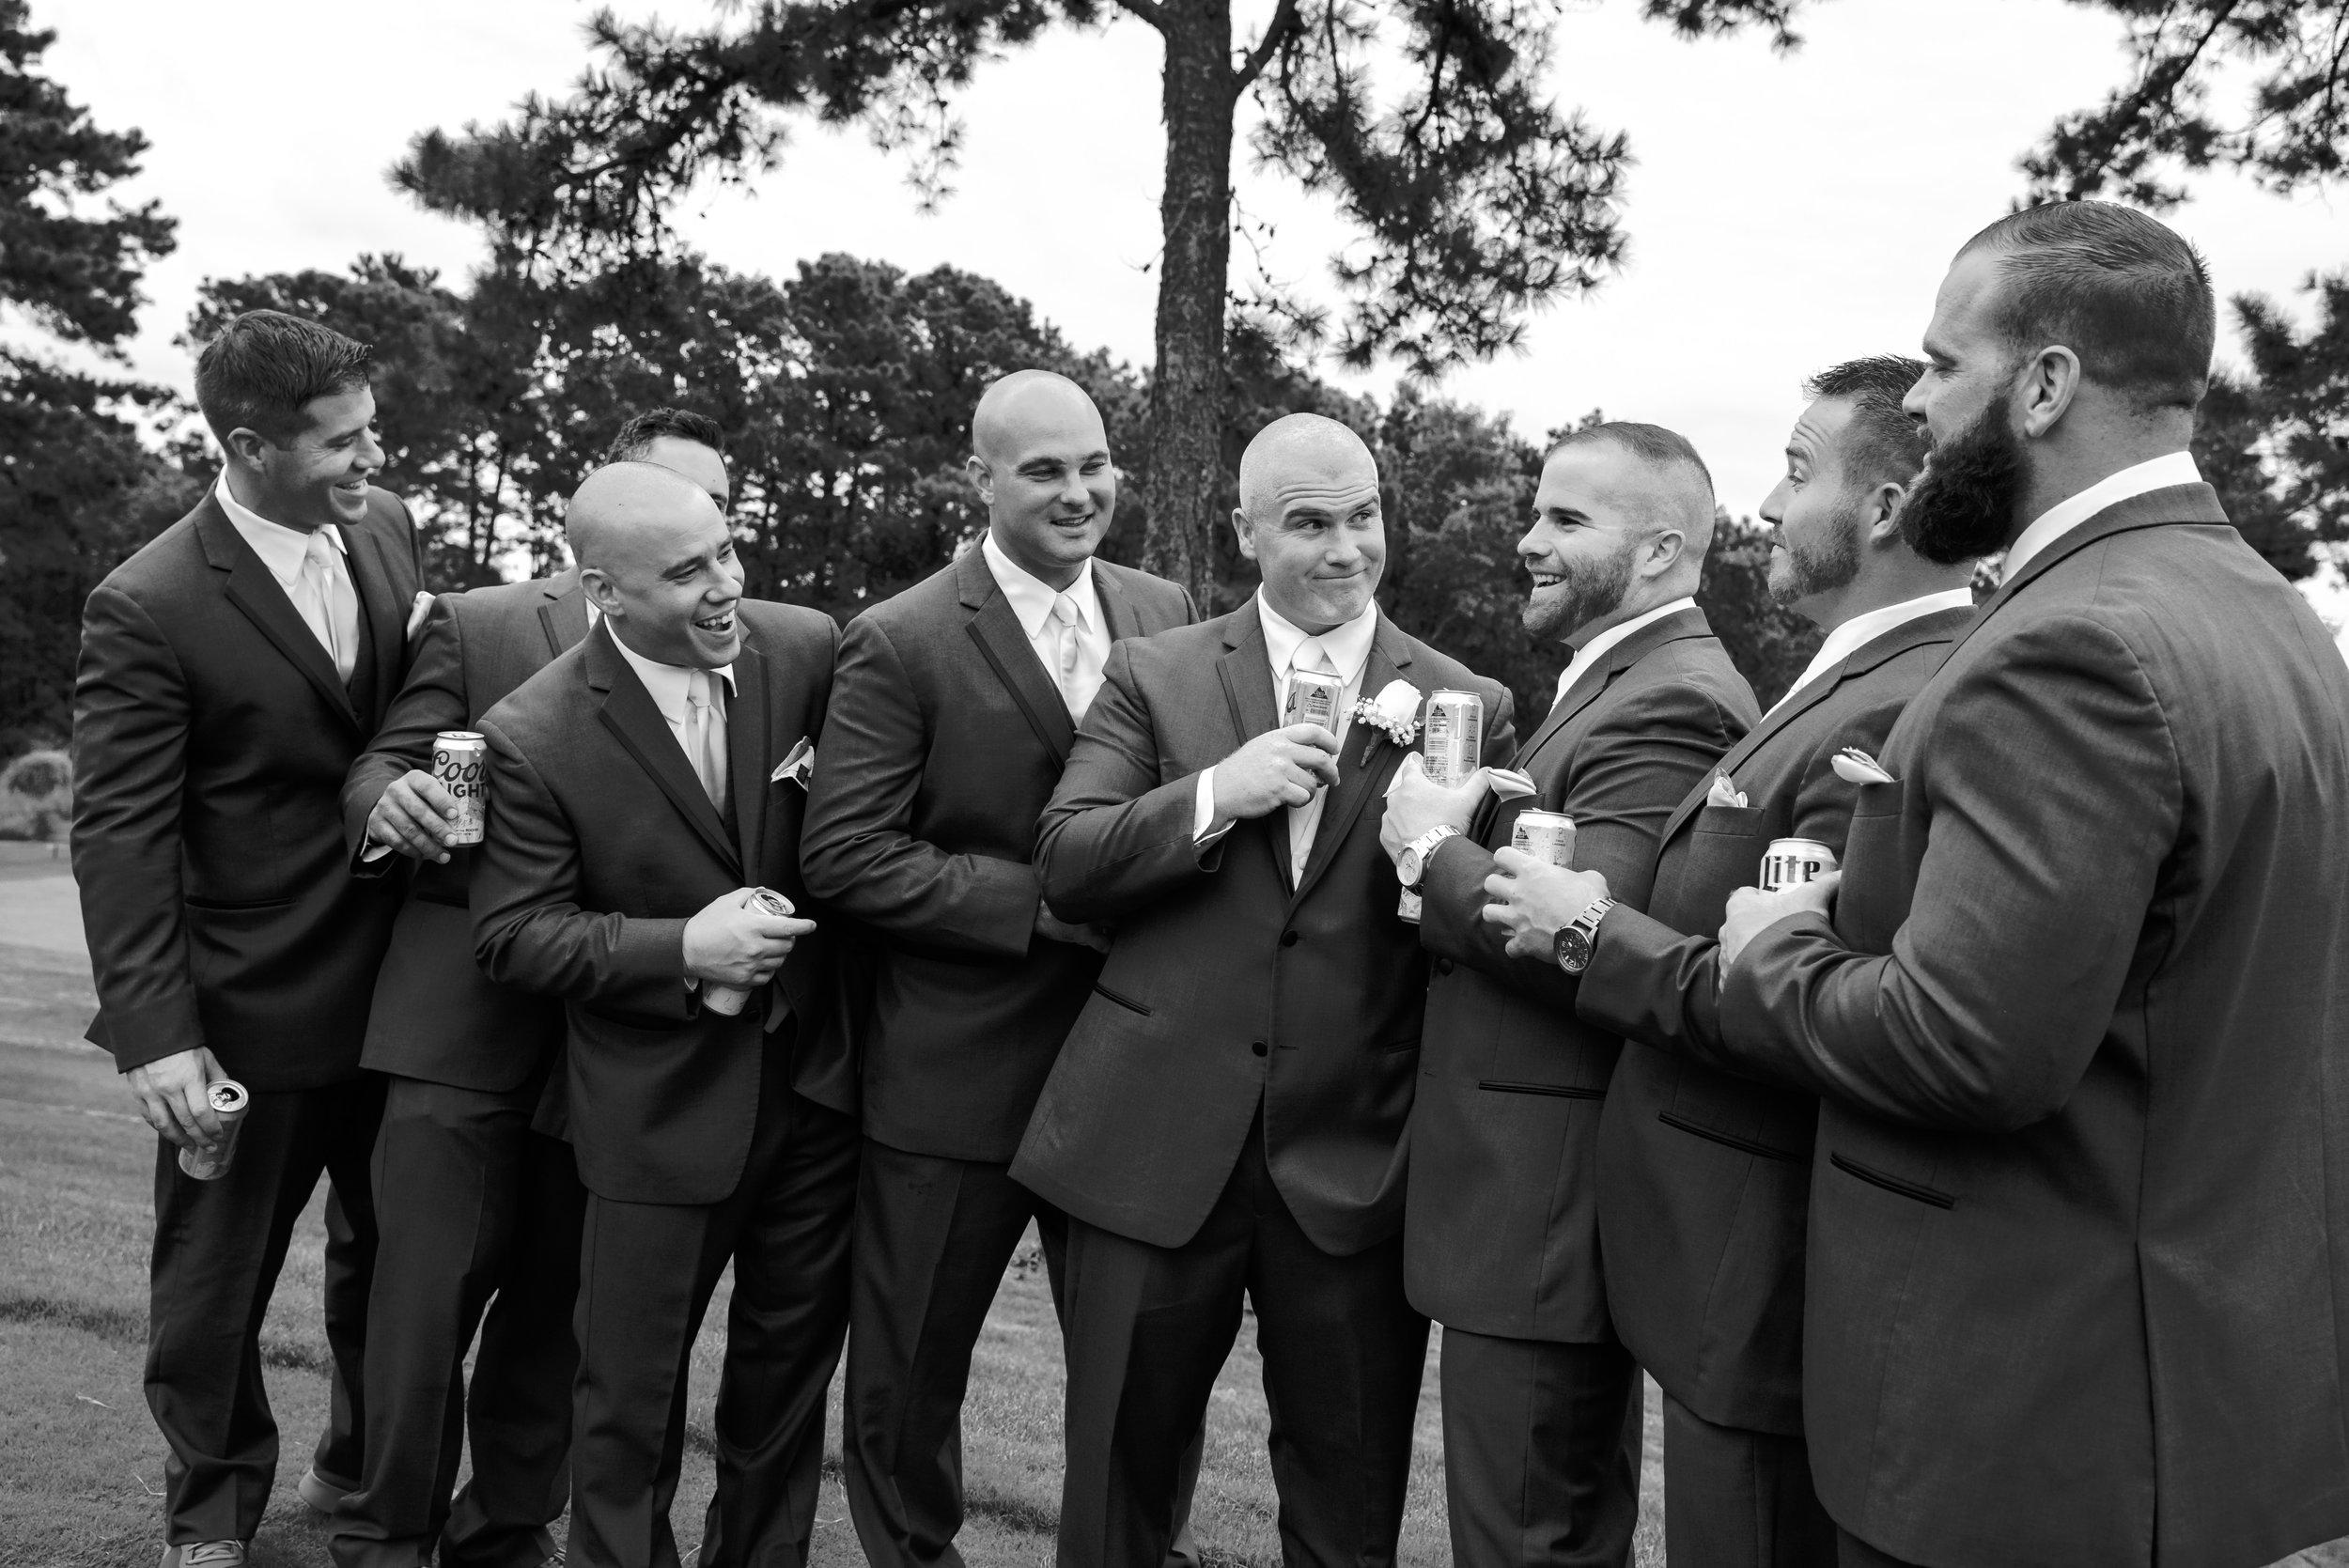 Seaoaks Wedding Photos Steph 9